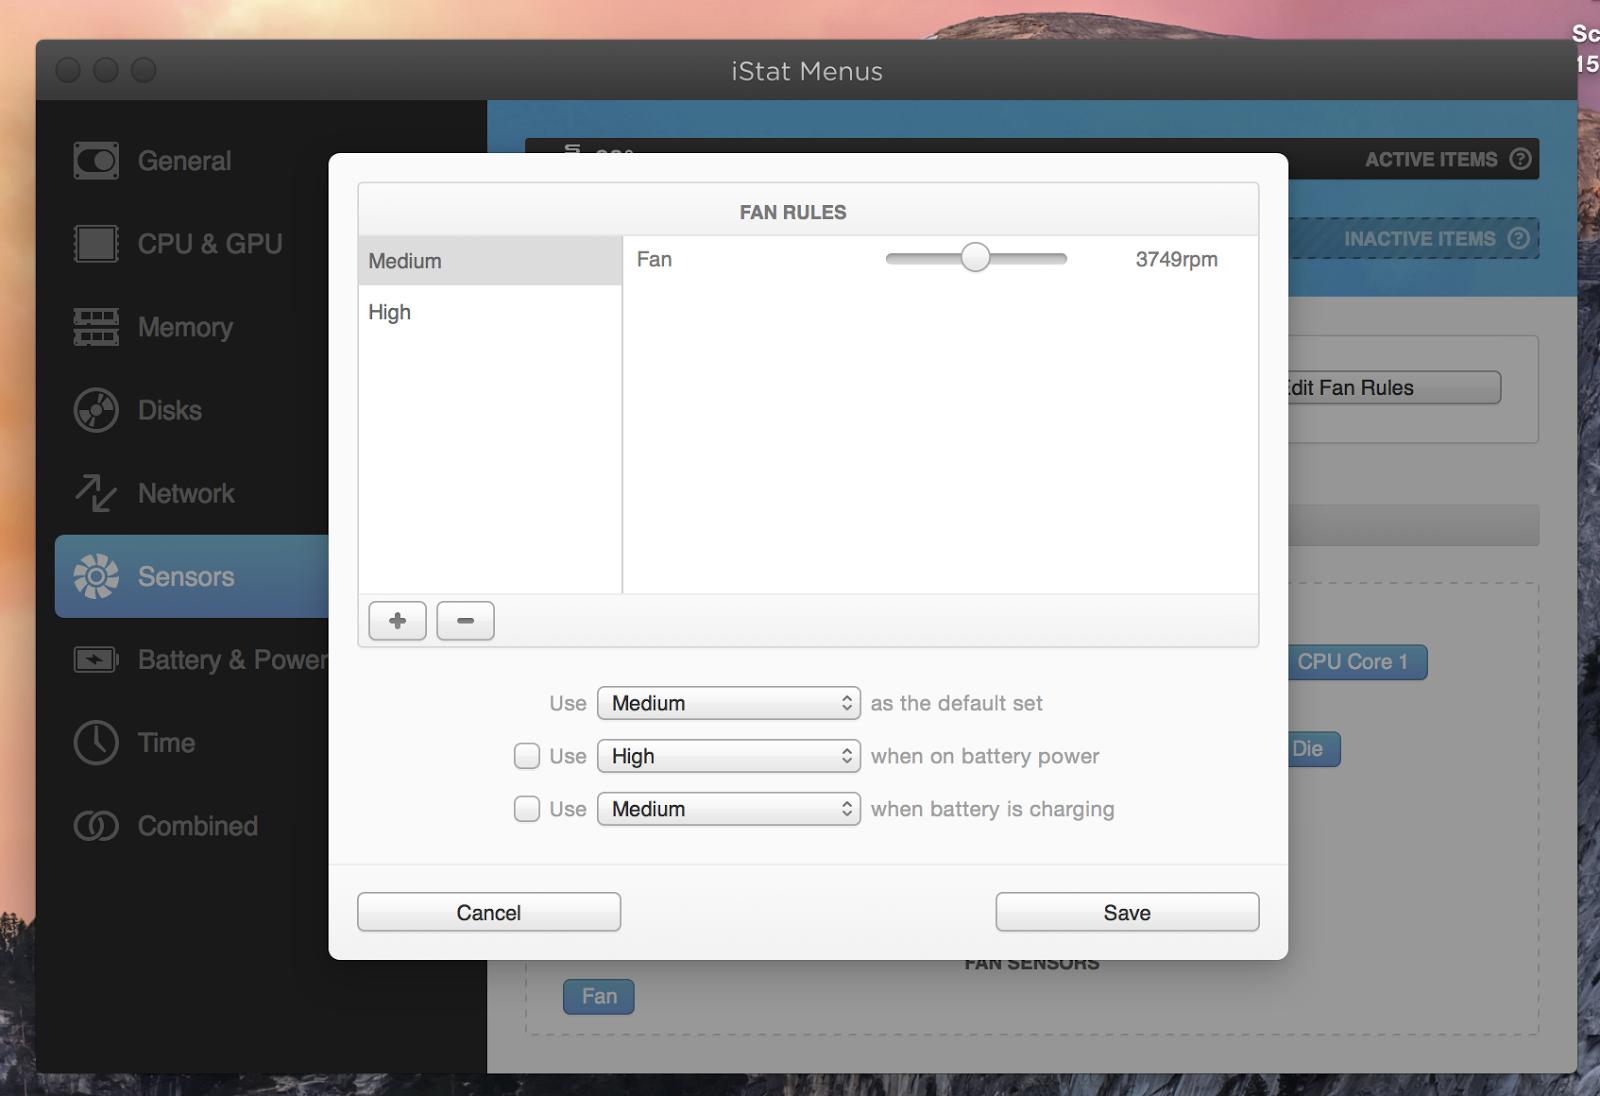 MAC MAC MAC: The God of monitor, the iStat menus